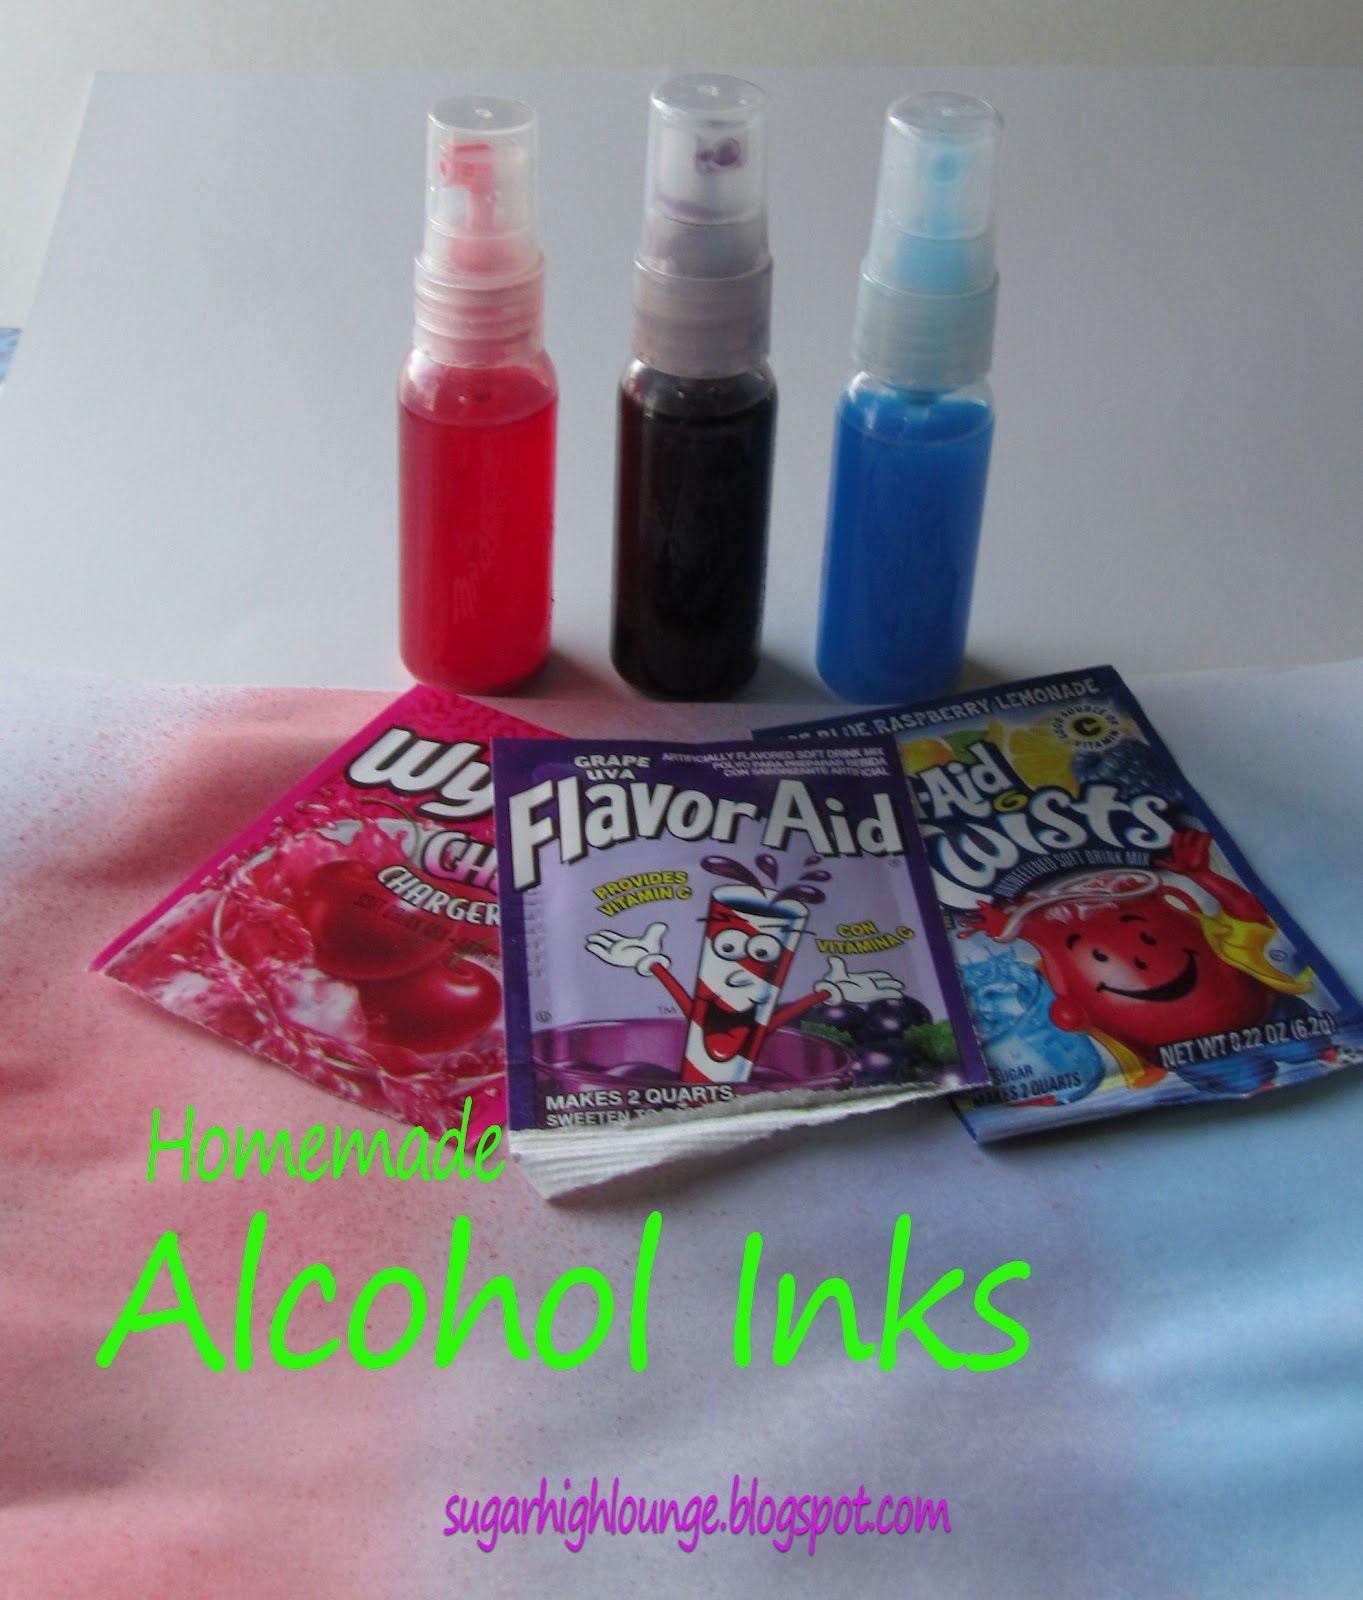 Homemade Alcohol Inks | Homemade alcohol Alcohol ink ...